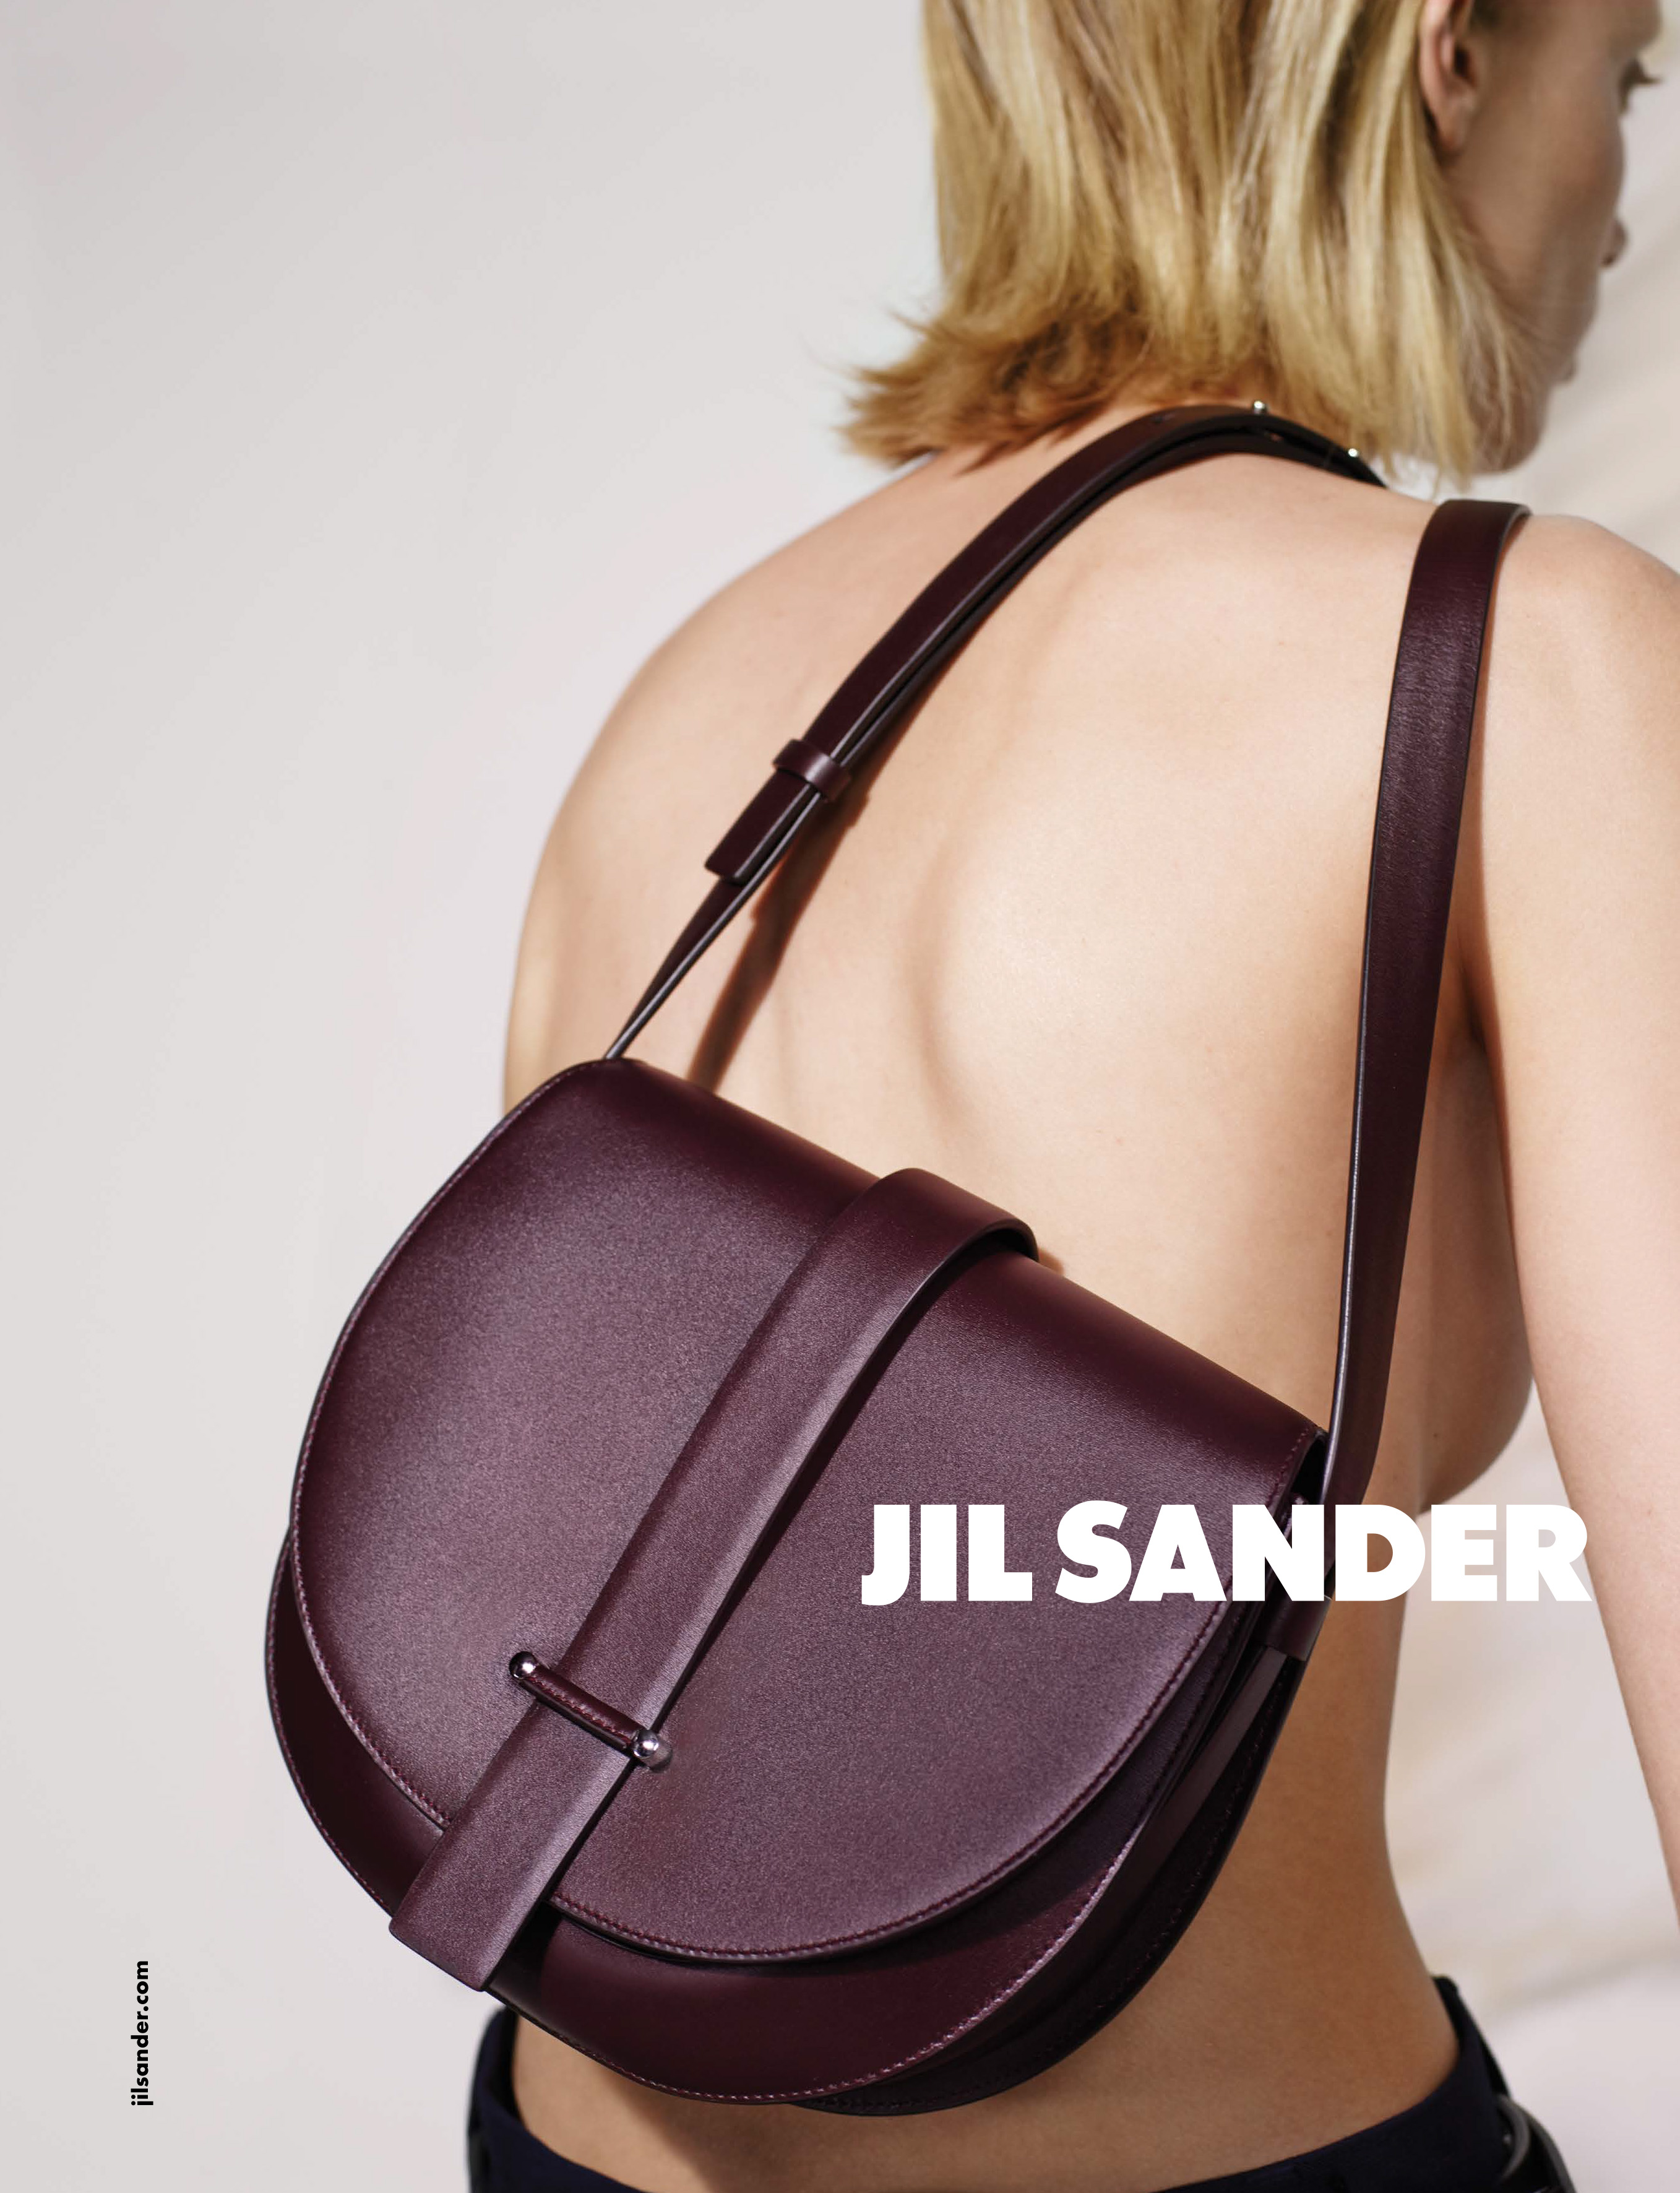 Jil Sander SS 2015 Advertising Campaign (5)_0